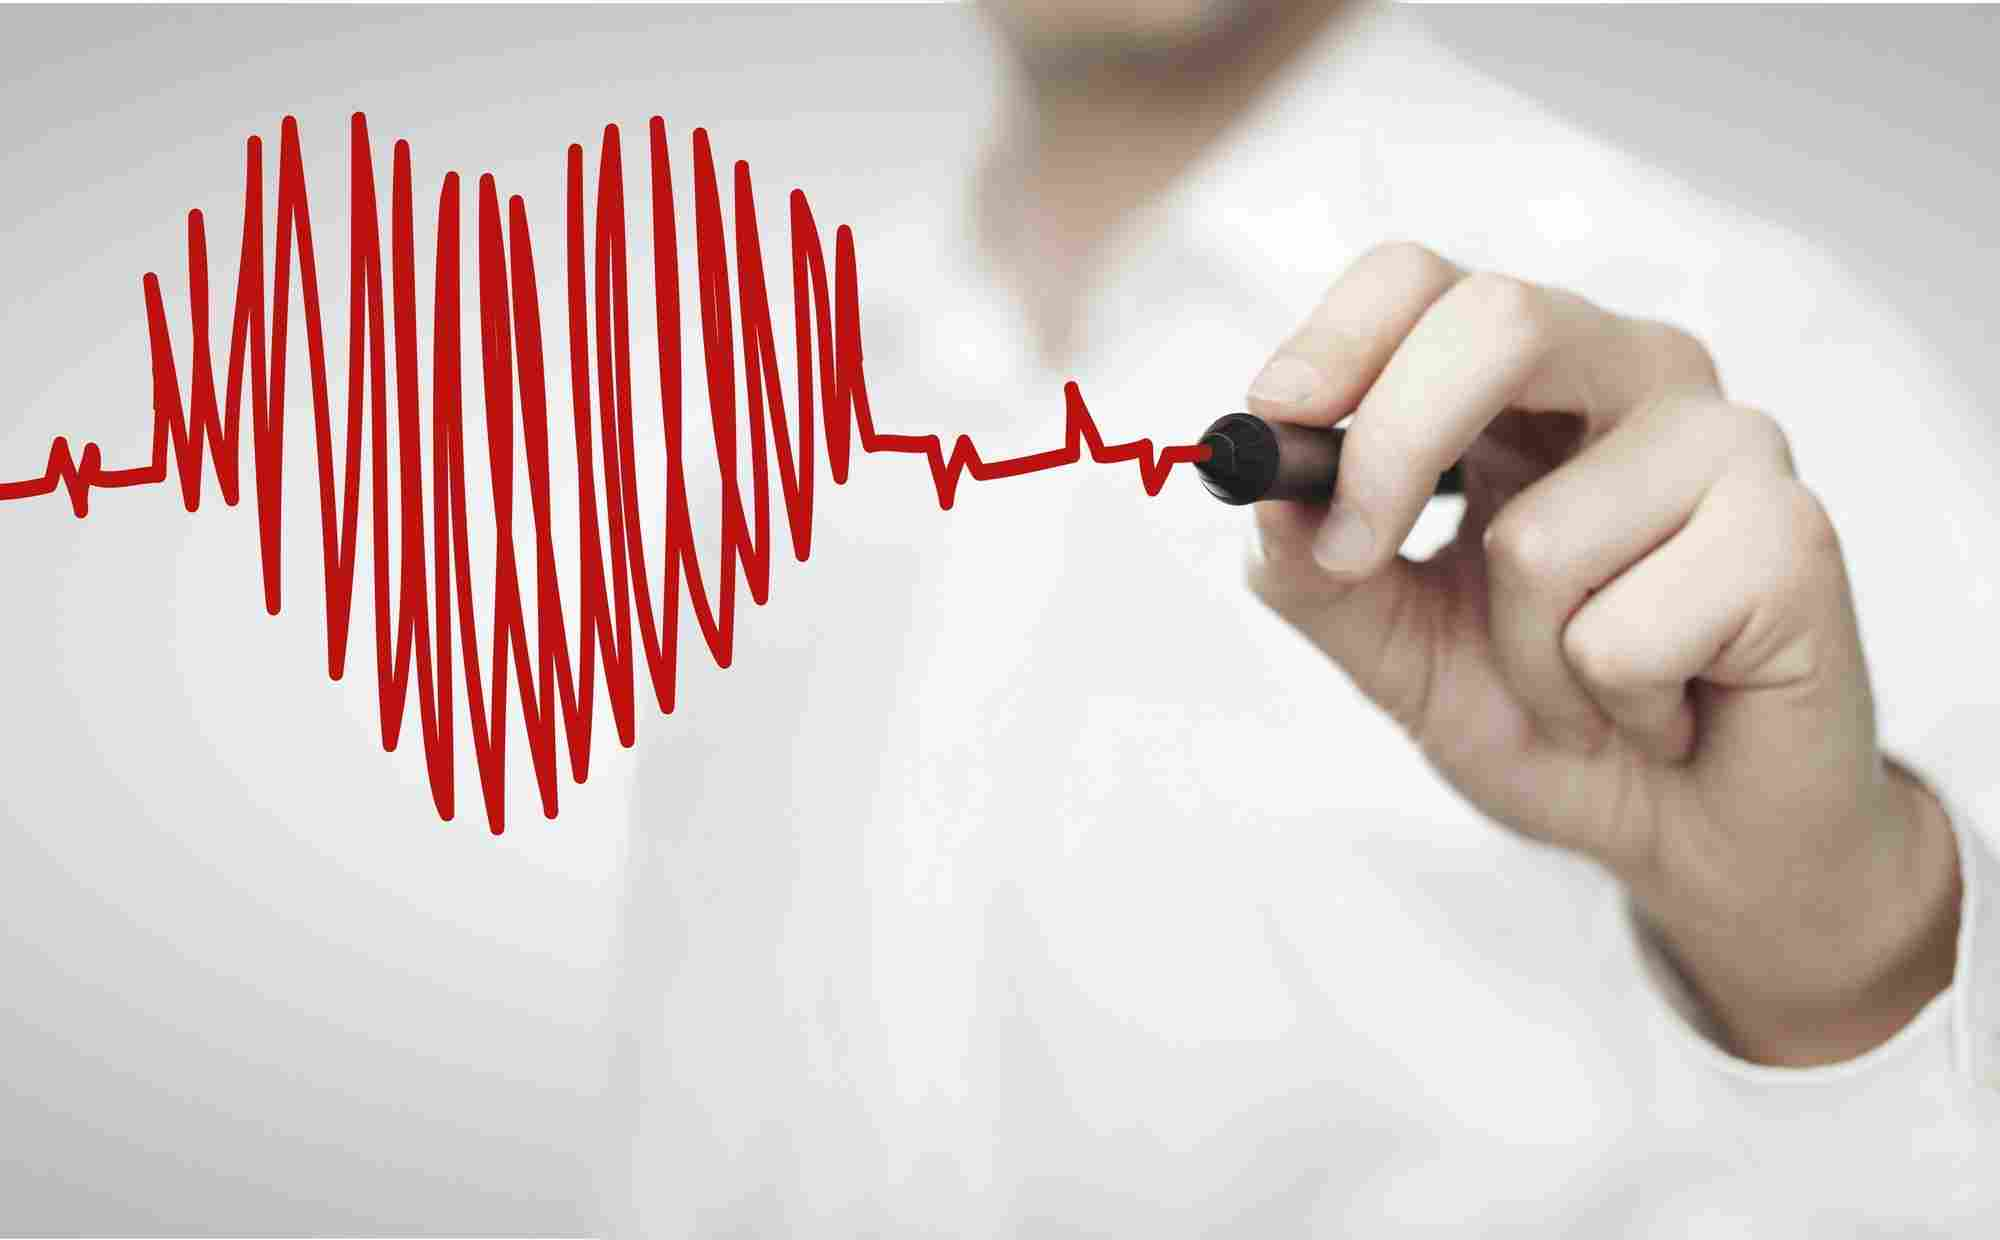 http://www.medquimheo.com.br/wp-content/uploads/2015/12/heart-health-1.jpg